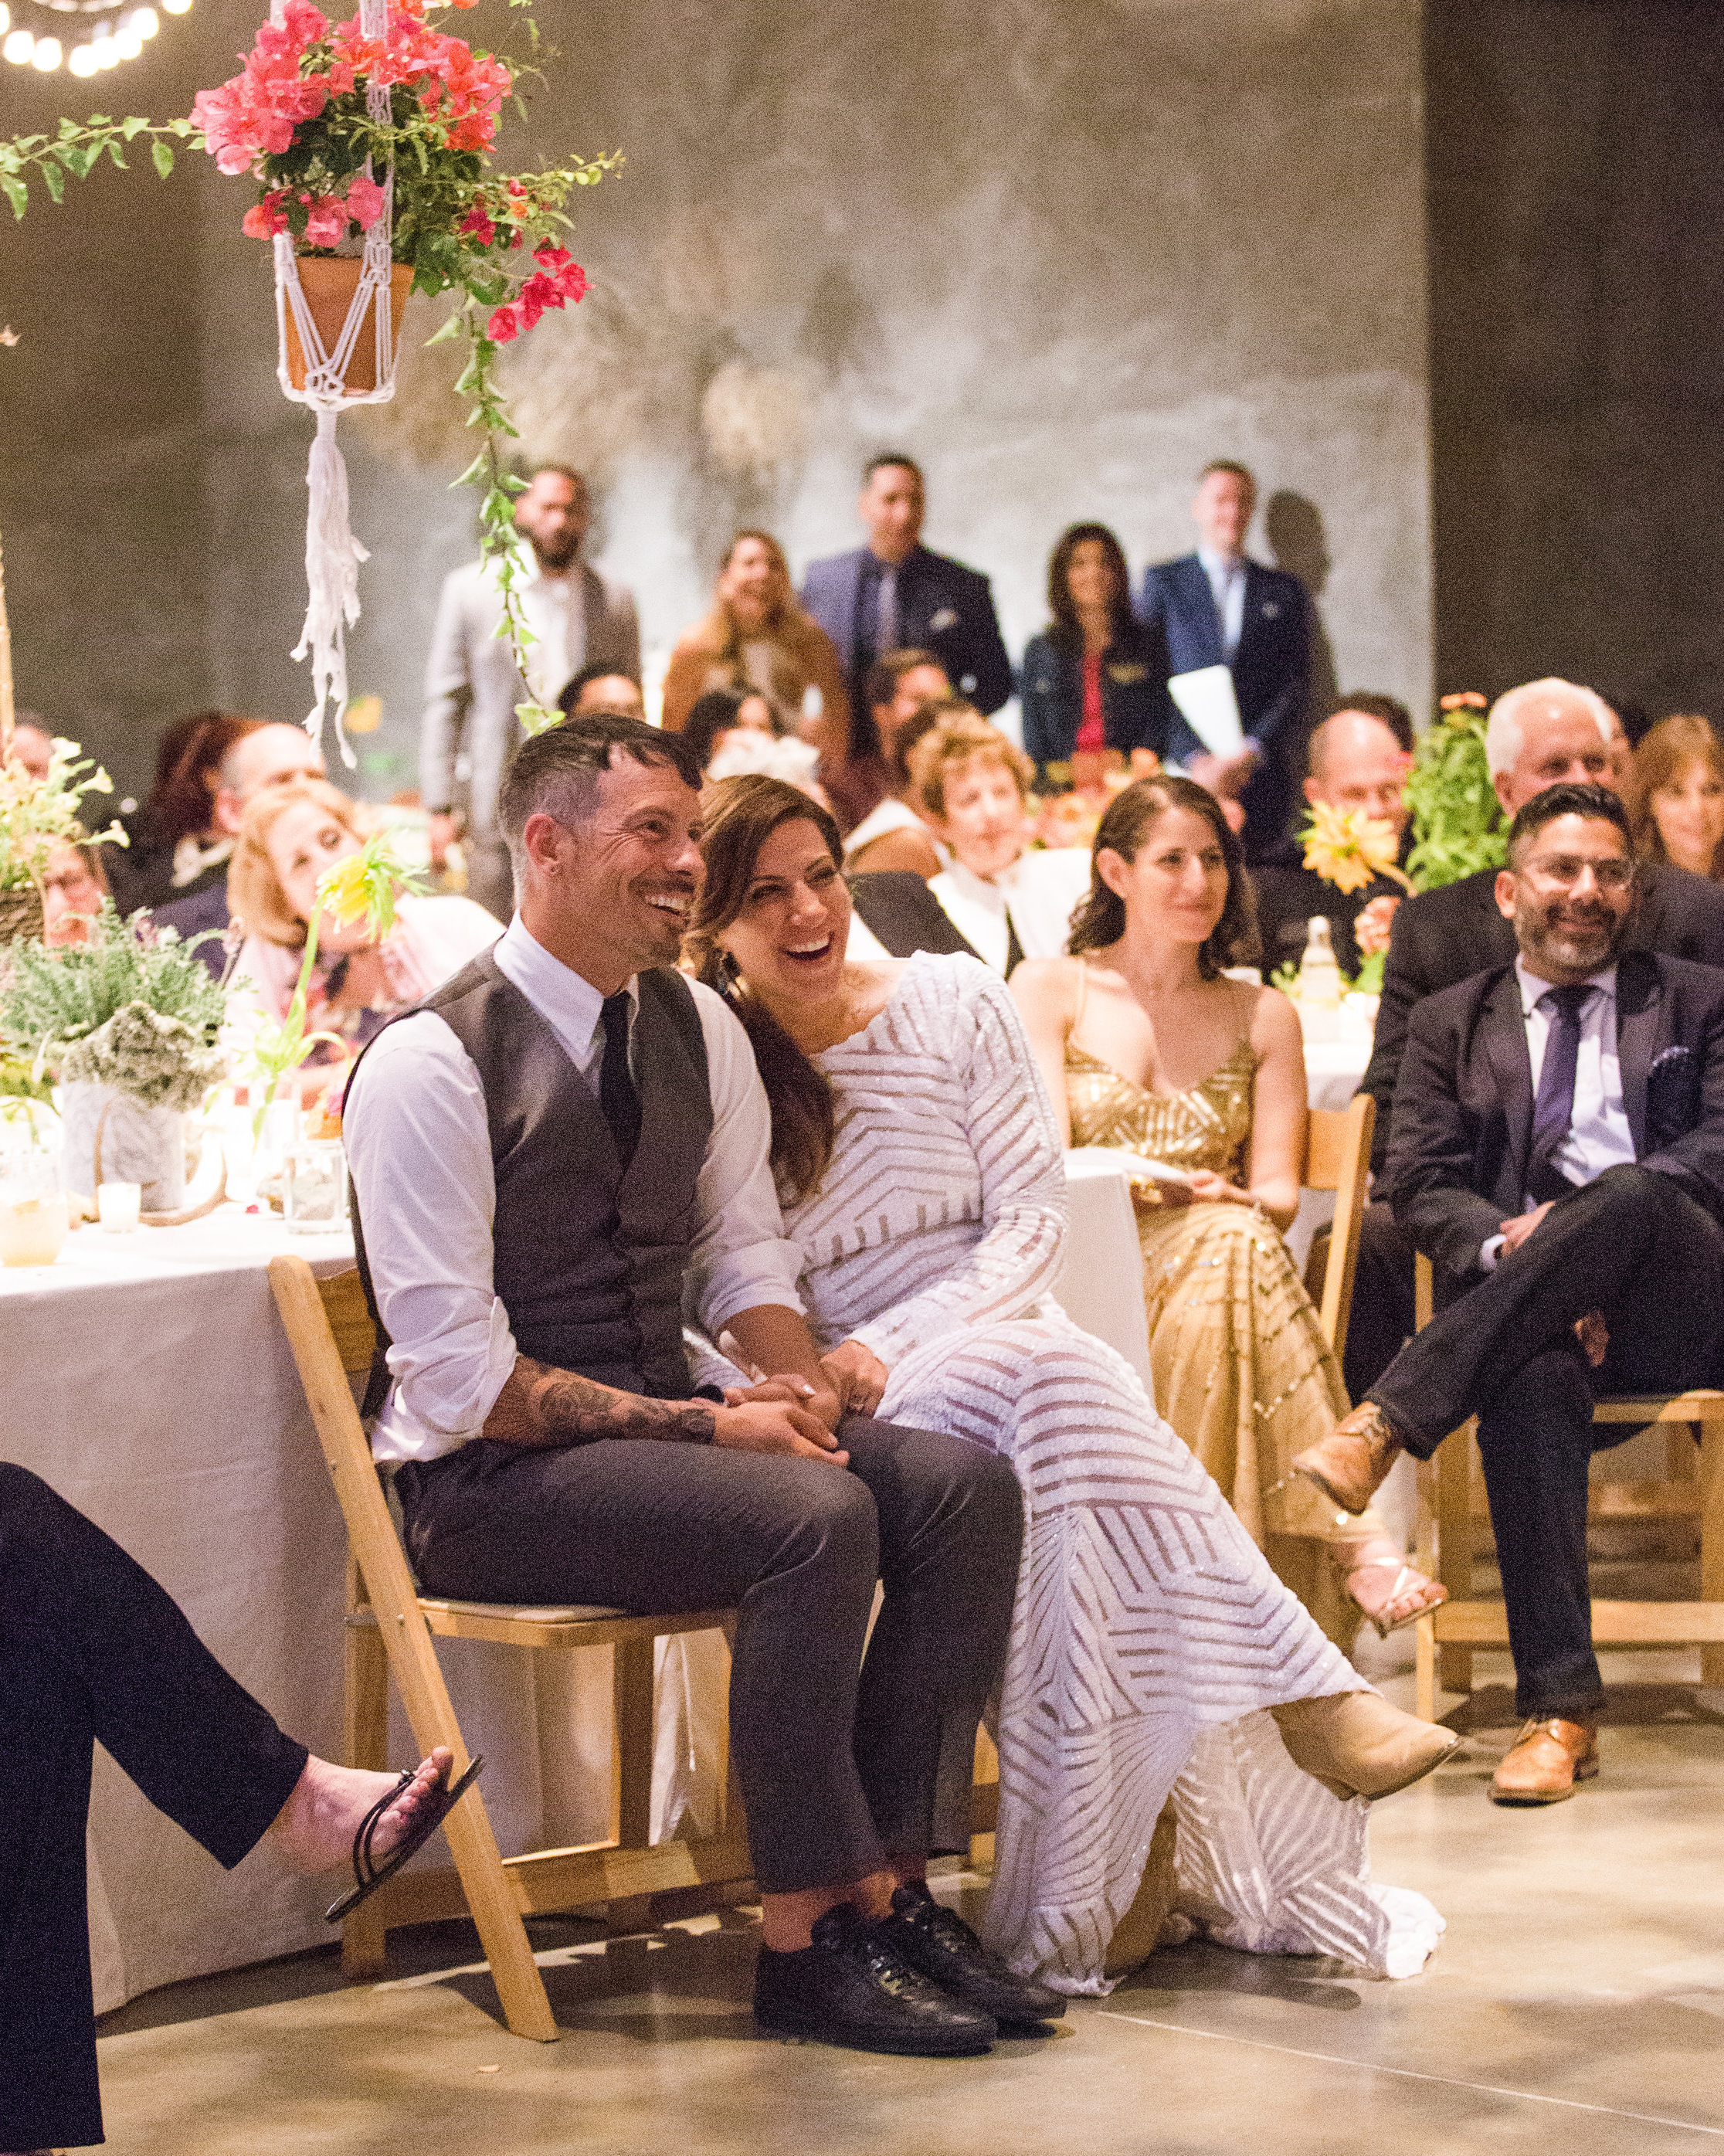 lara-chad-wedding-toast-666-s112306-1115.jpg